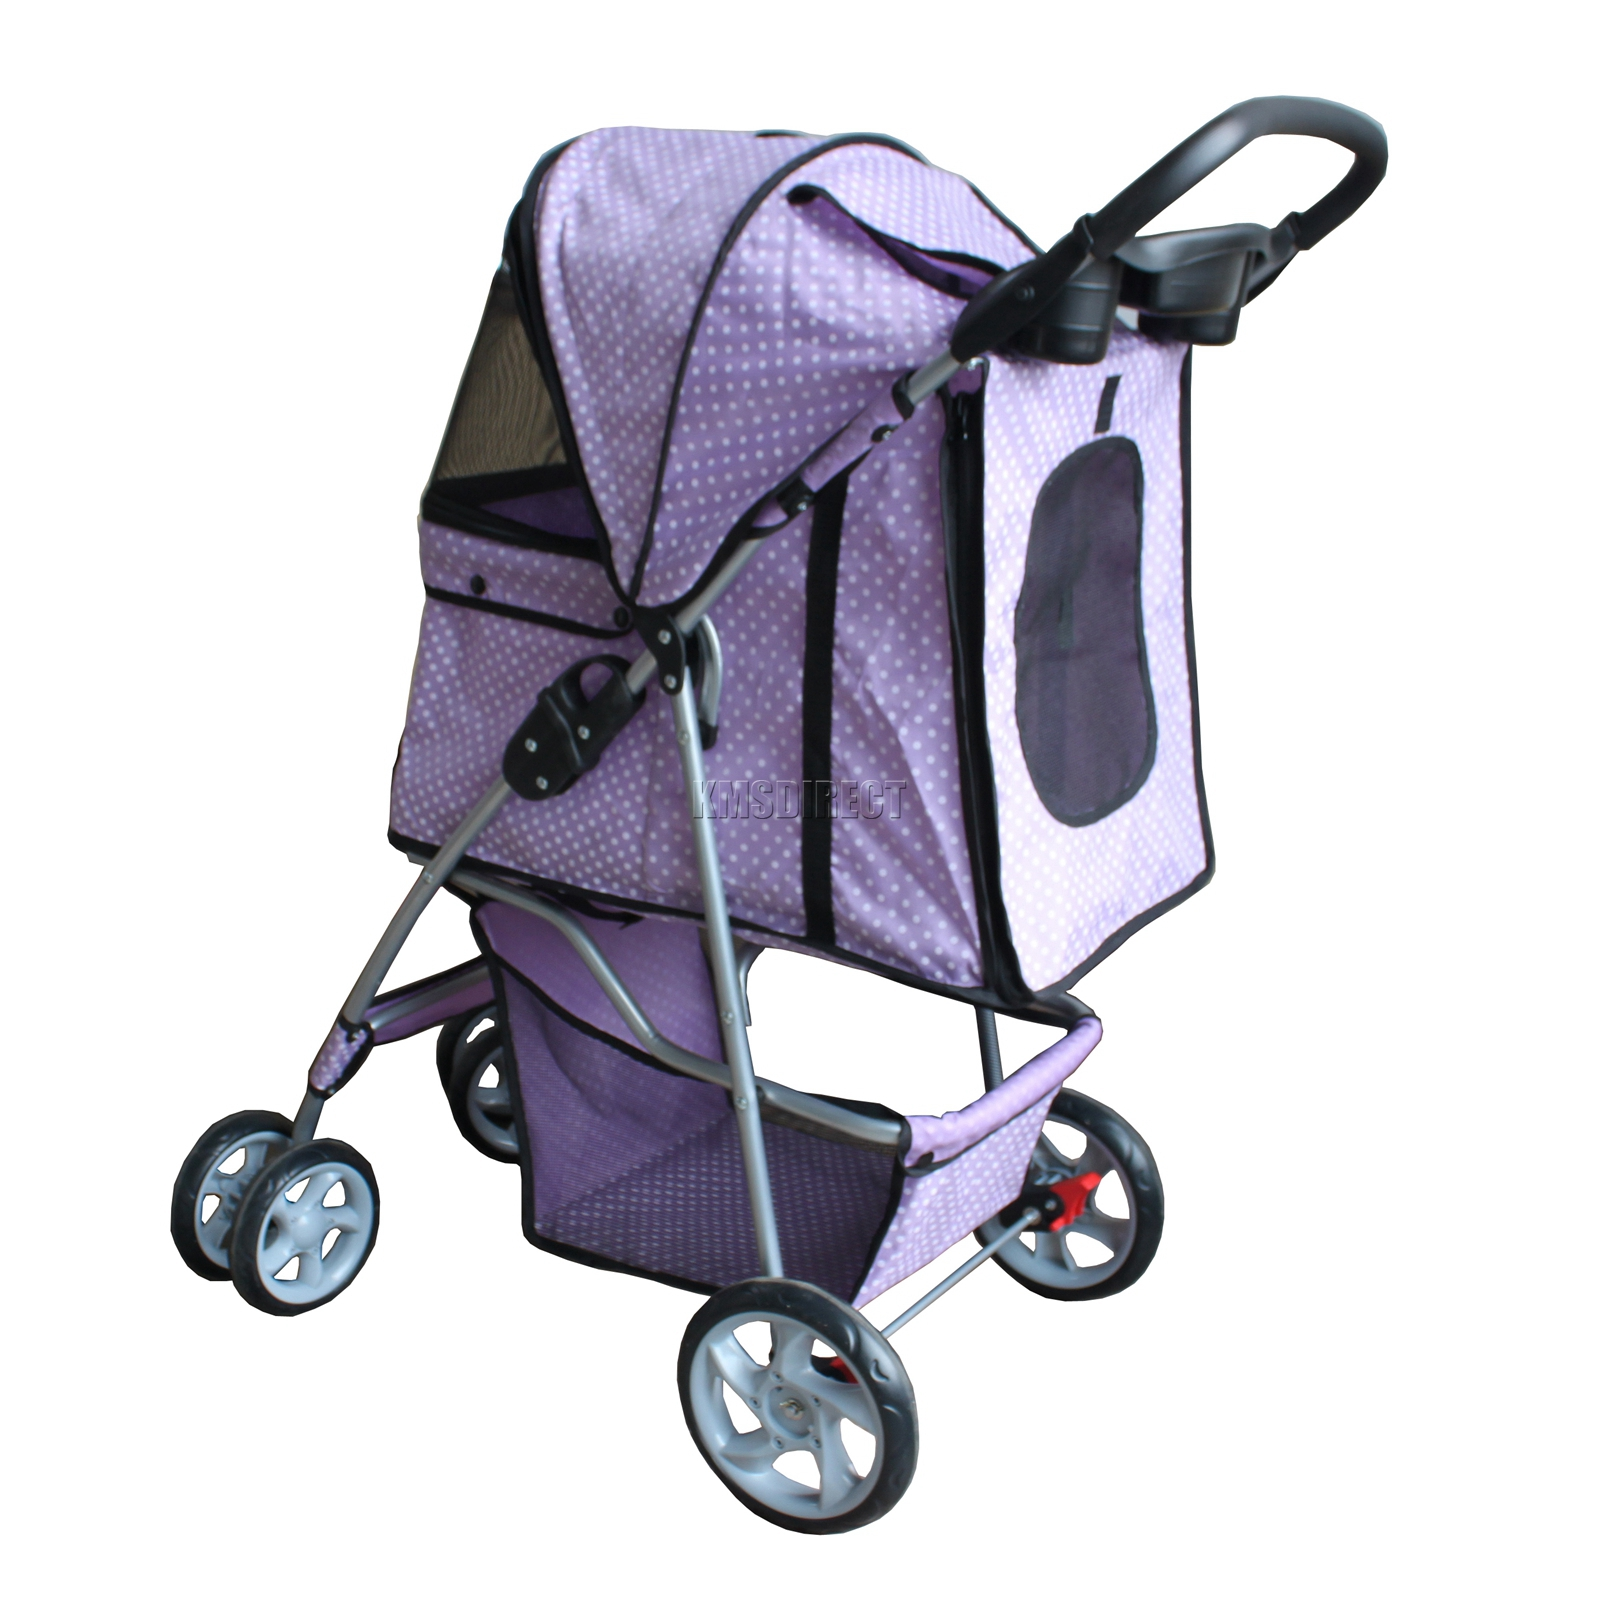 Free Dog Stroller